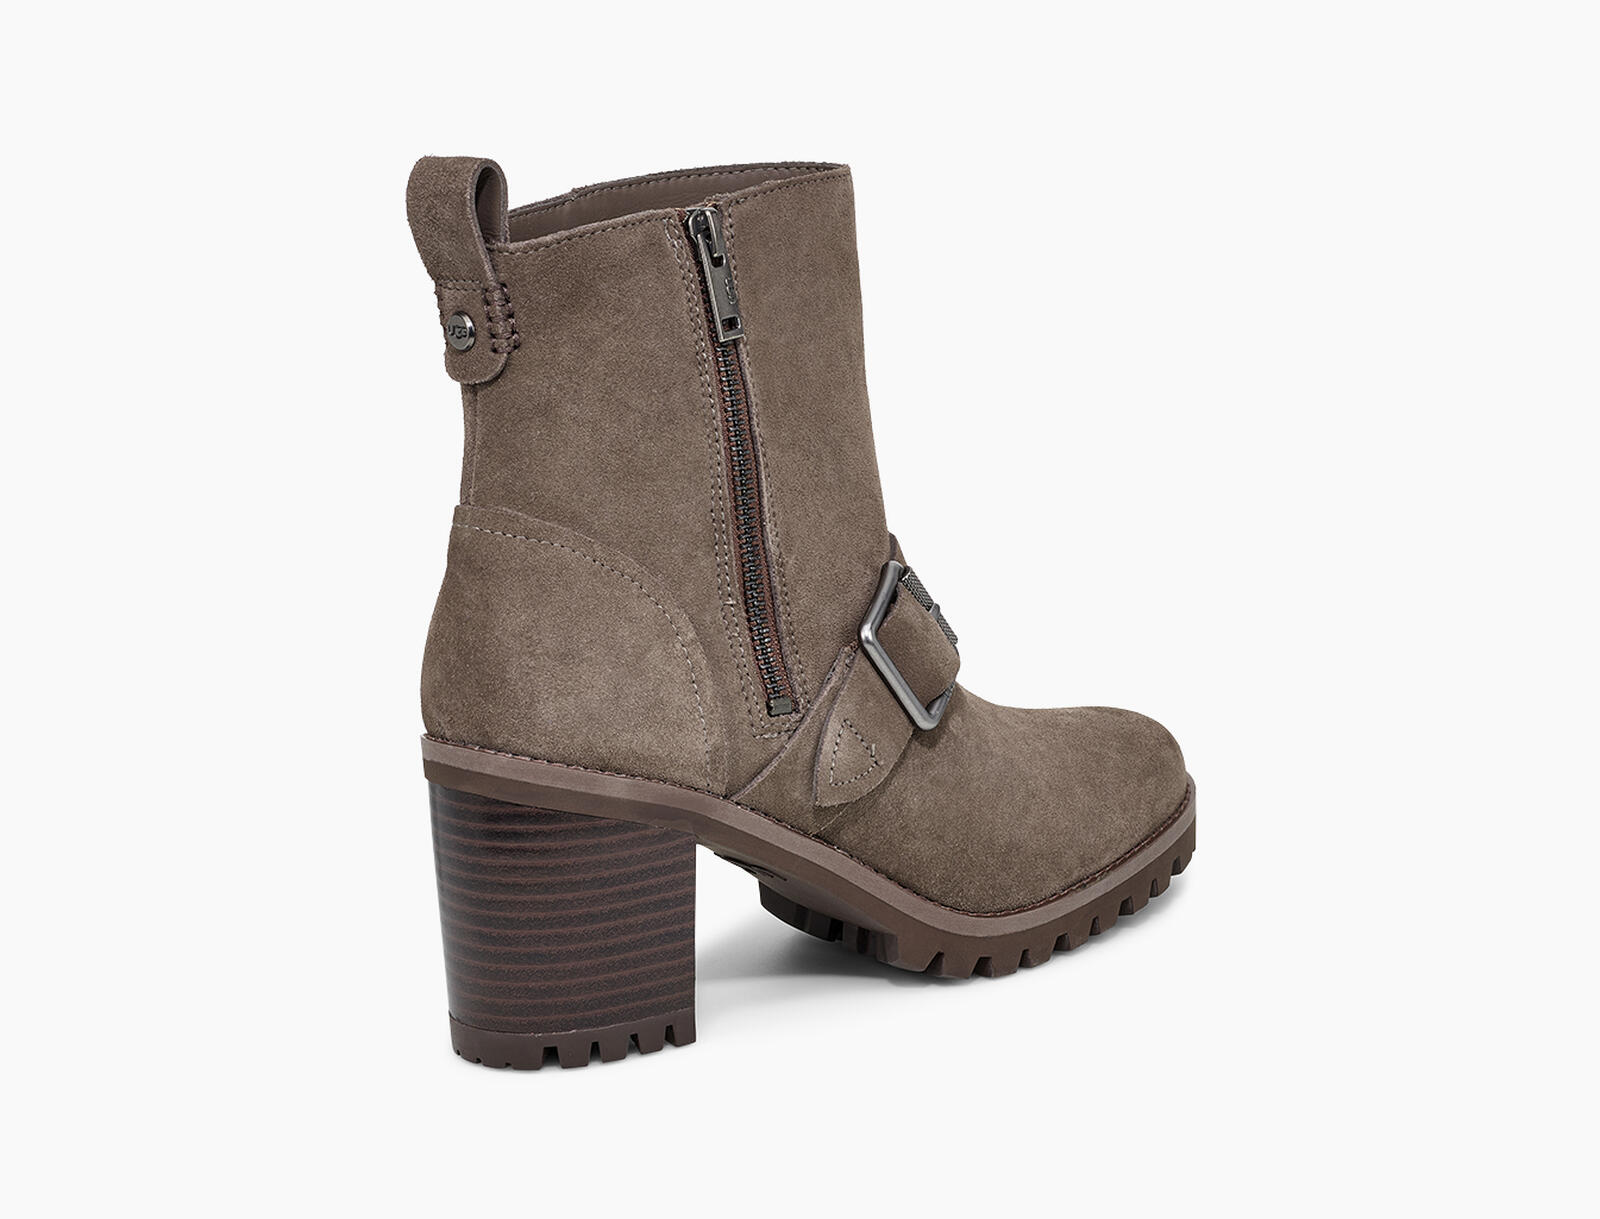 Fern Suede Boot